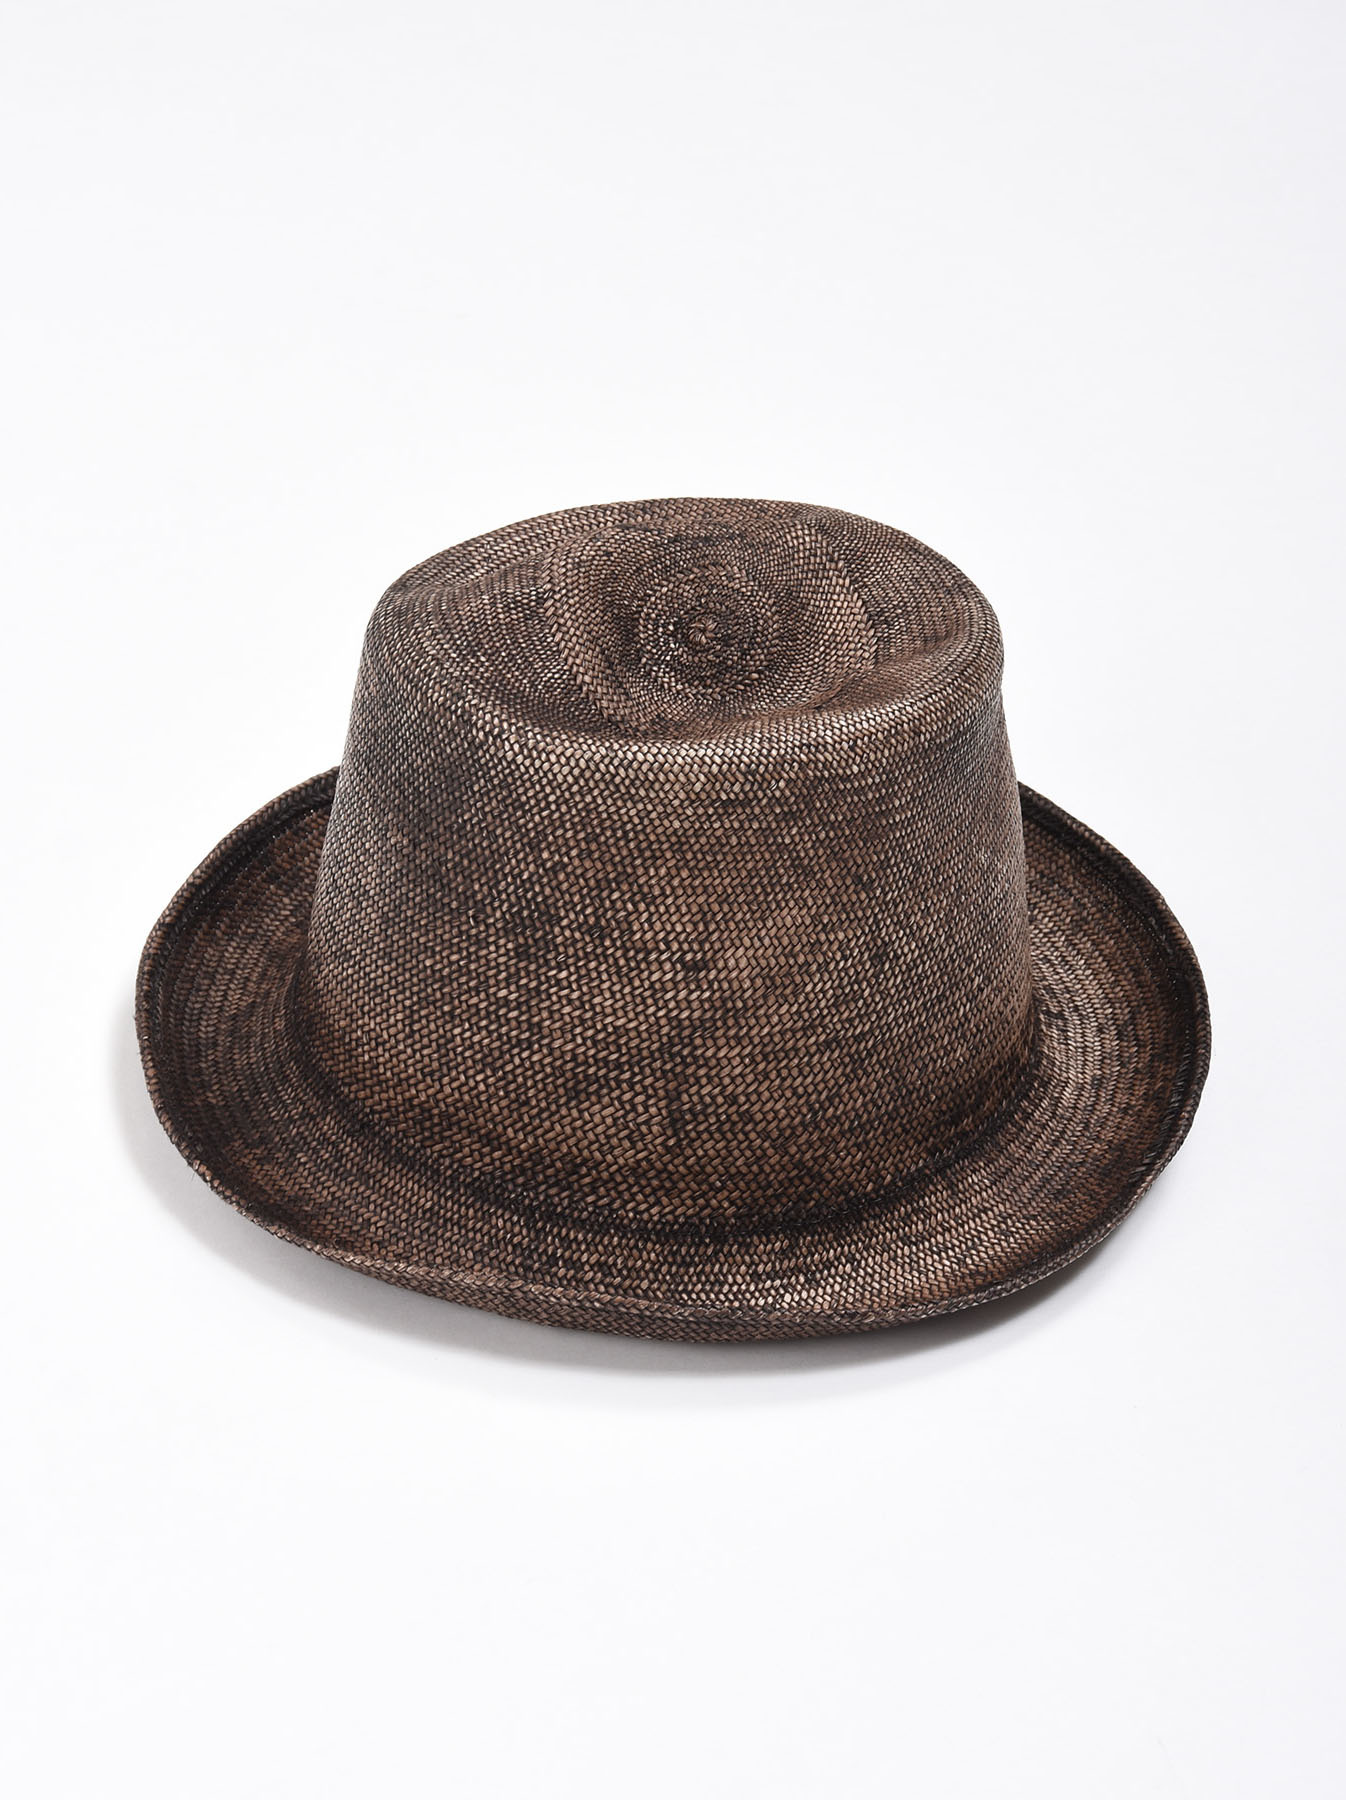 Piece-dyed Panama Hat-1